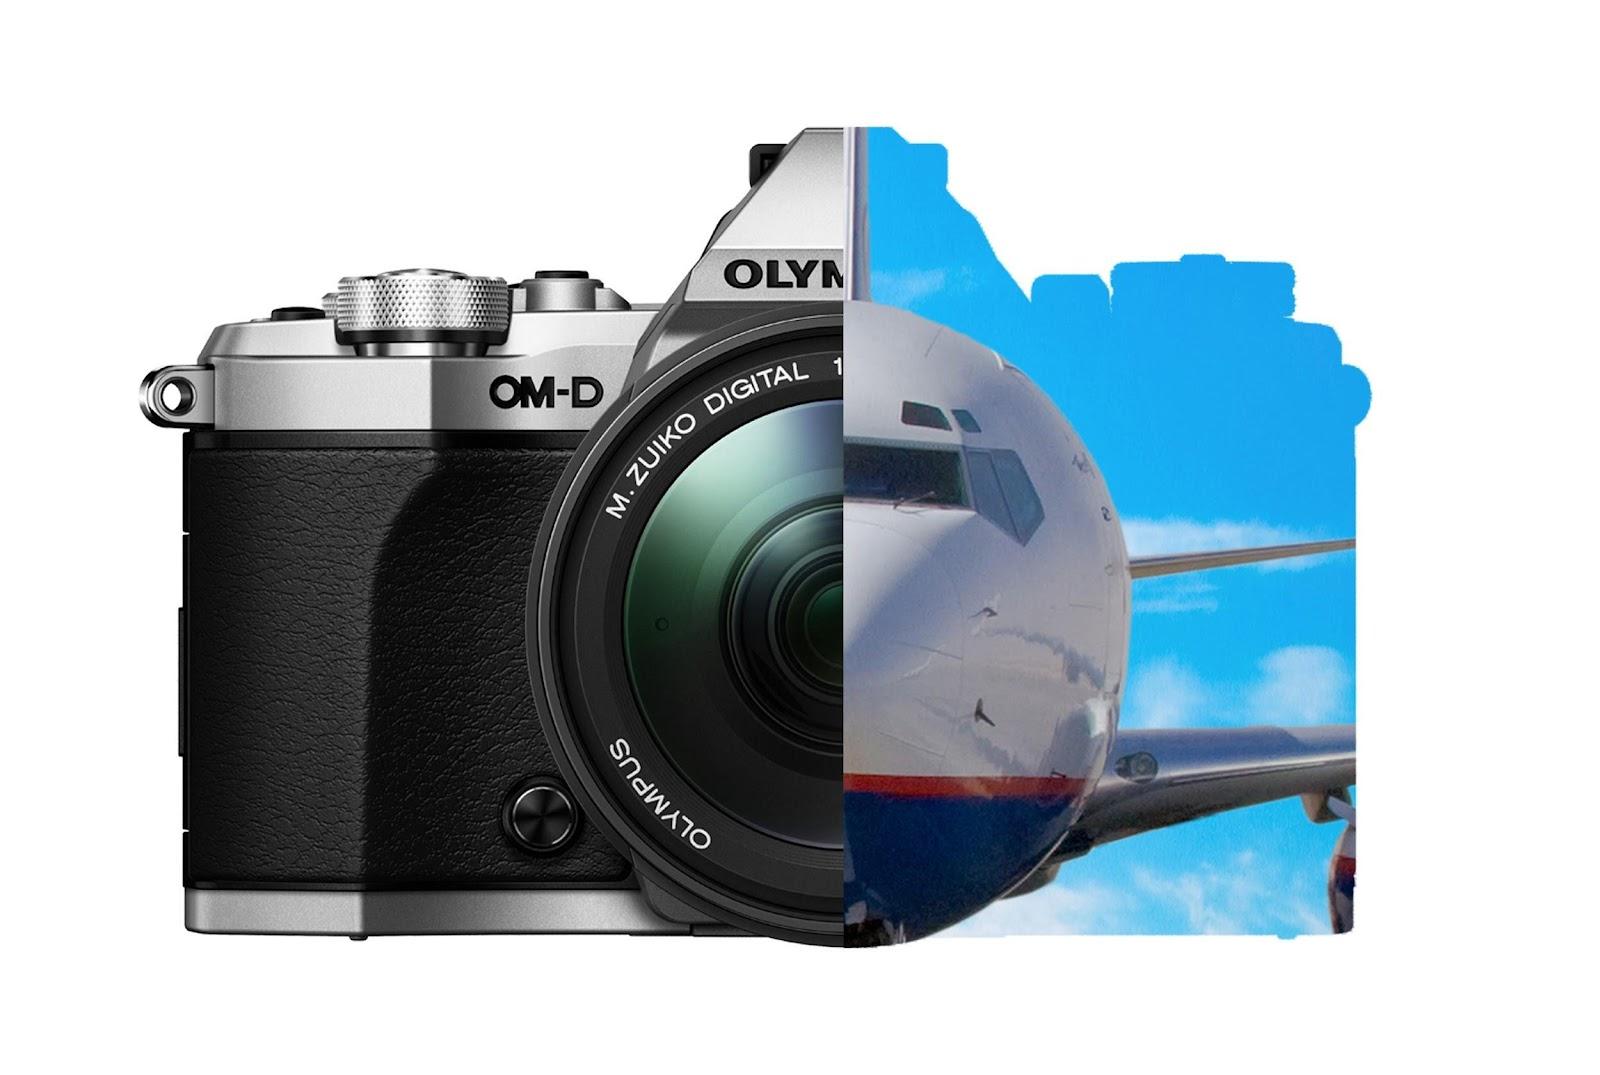 olympus camera shot.jpg